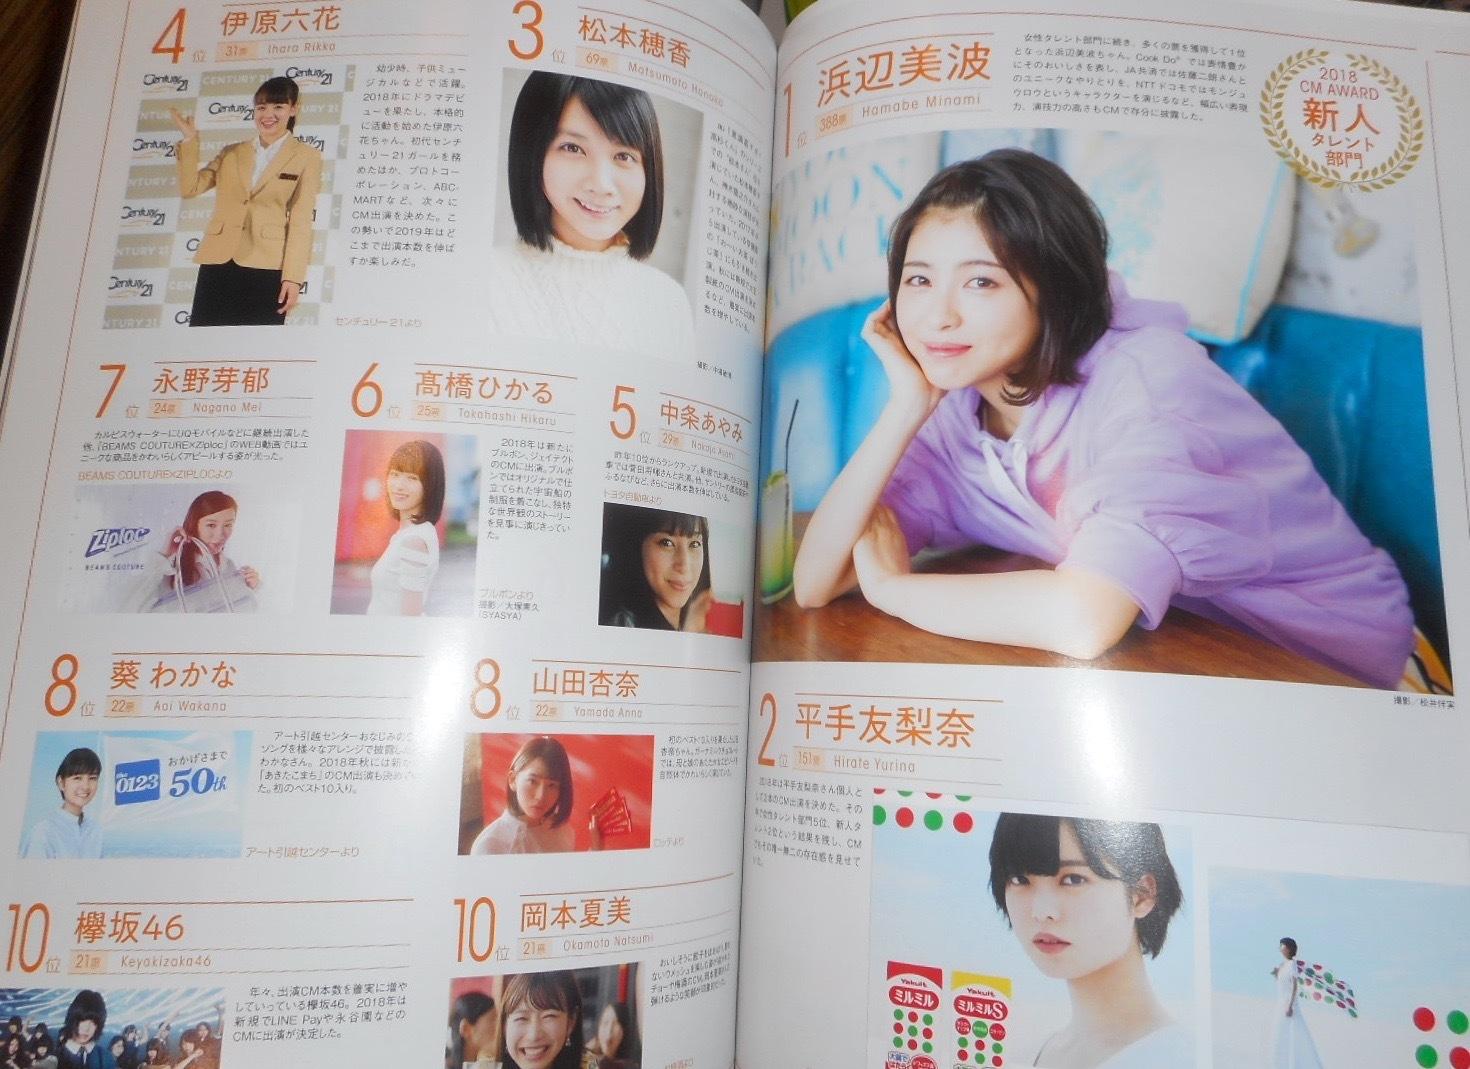 CM_NOW2018_12浜辺美波新人タレント部門